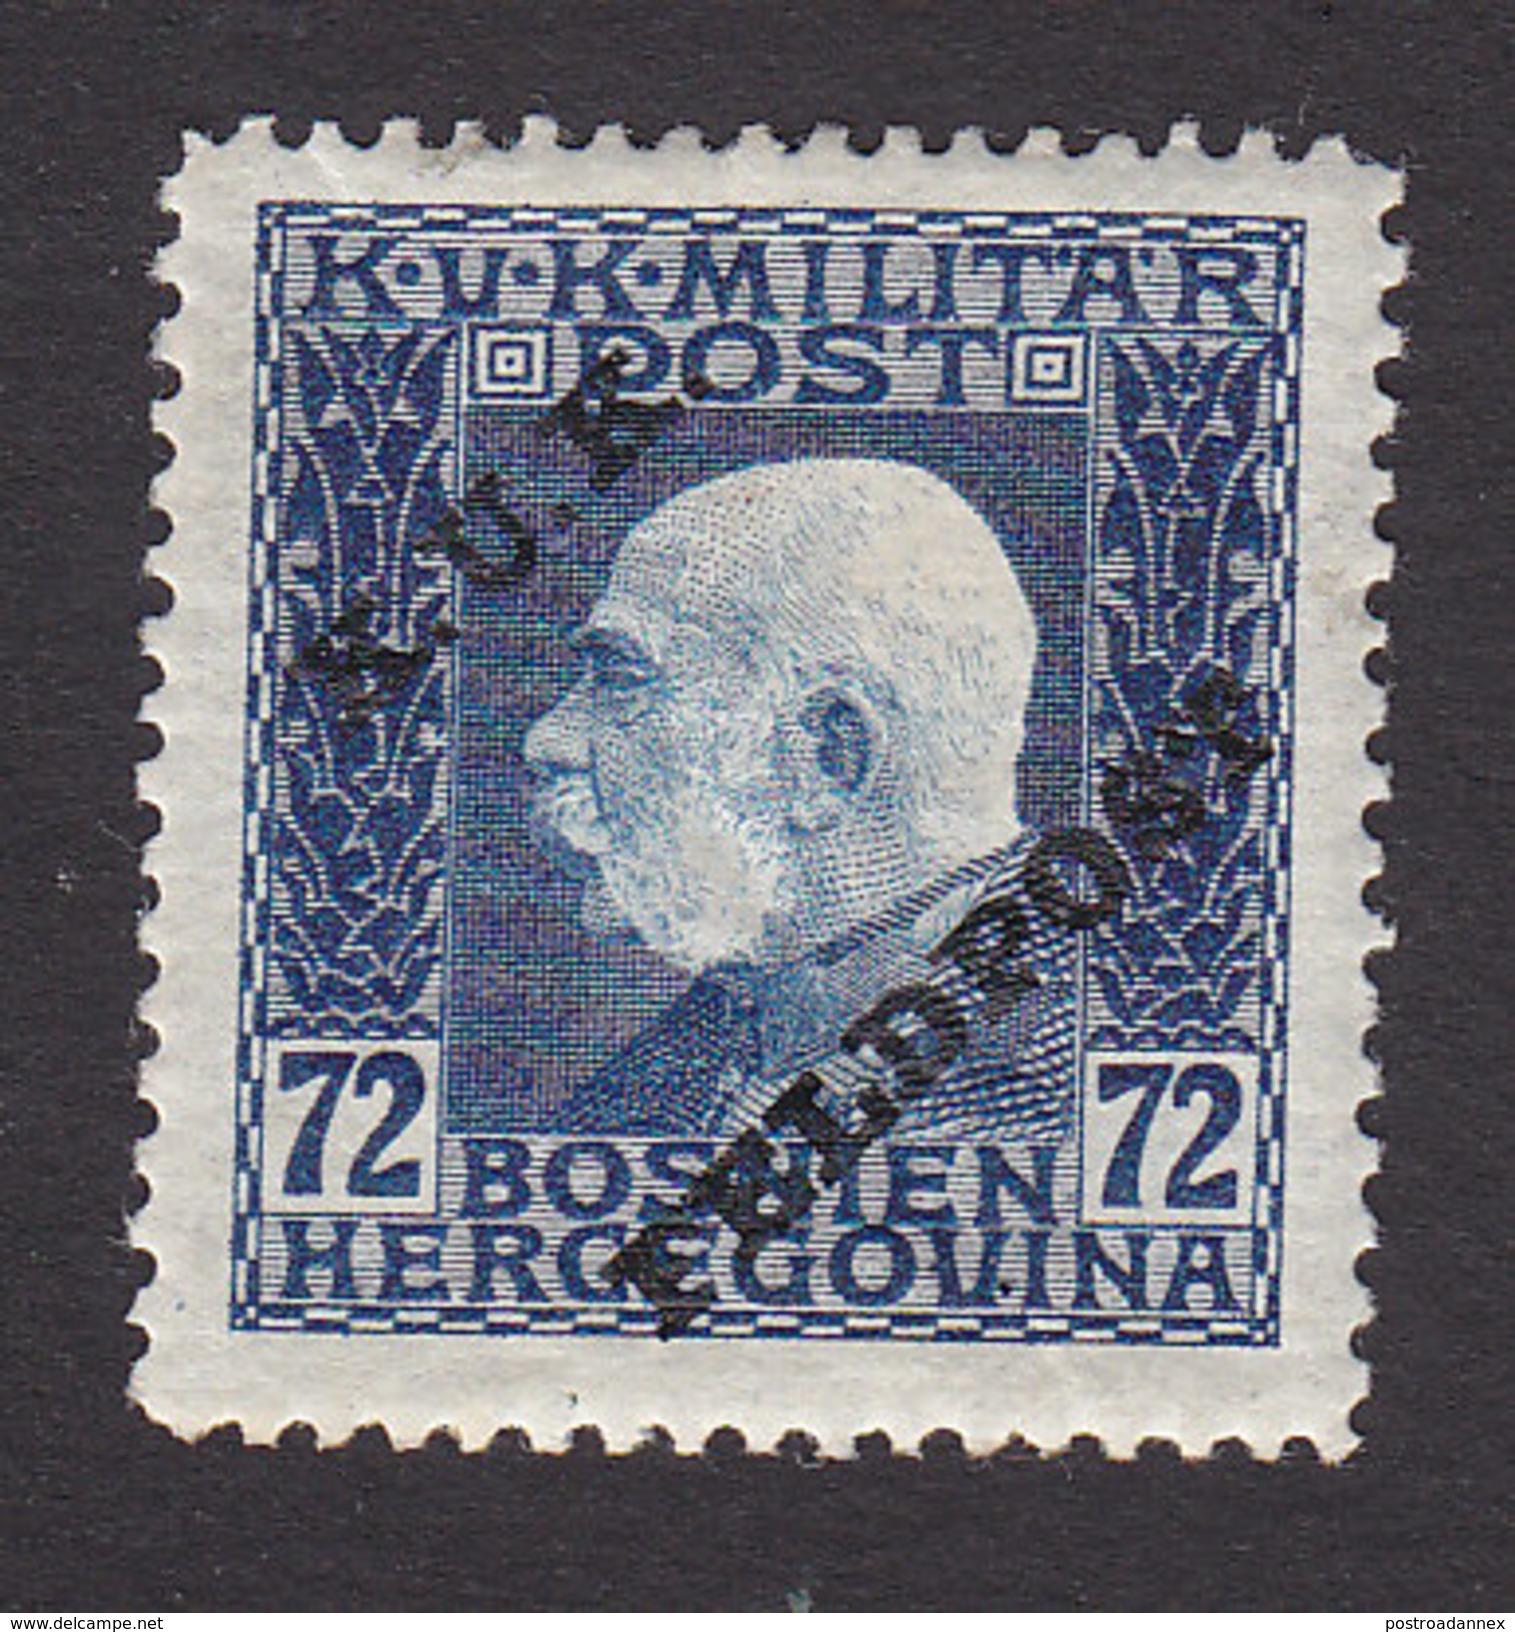 Austria, Scott #M16, Mint Hinged, Franz Josef Overprinted Military Stamp, Issued 1915 - Autriche